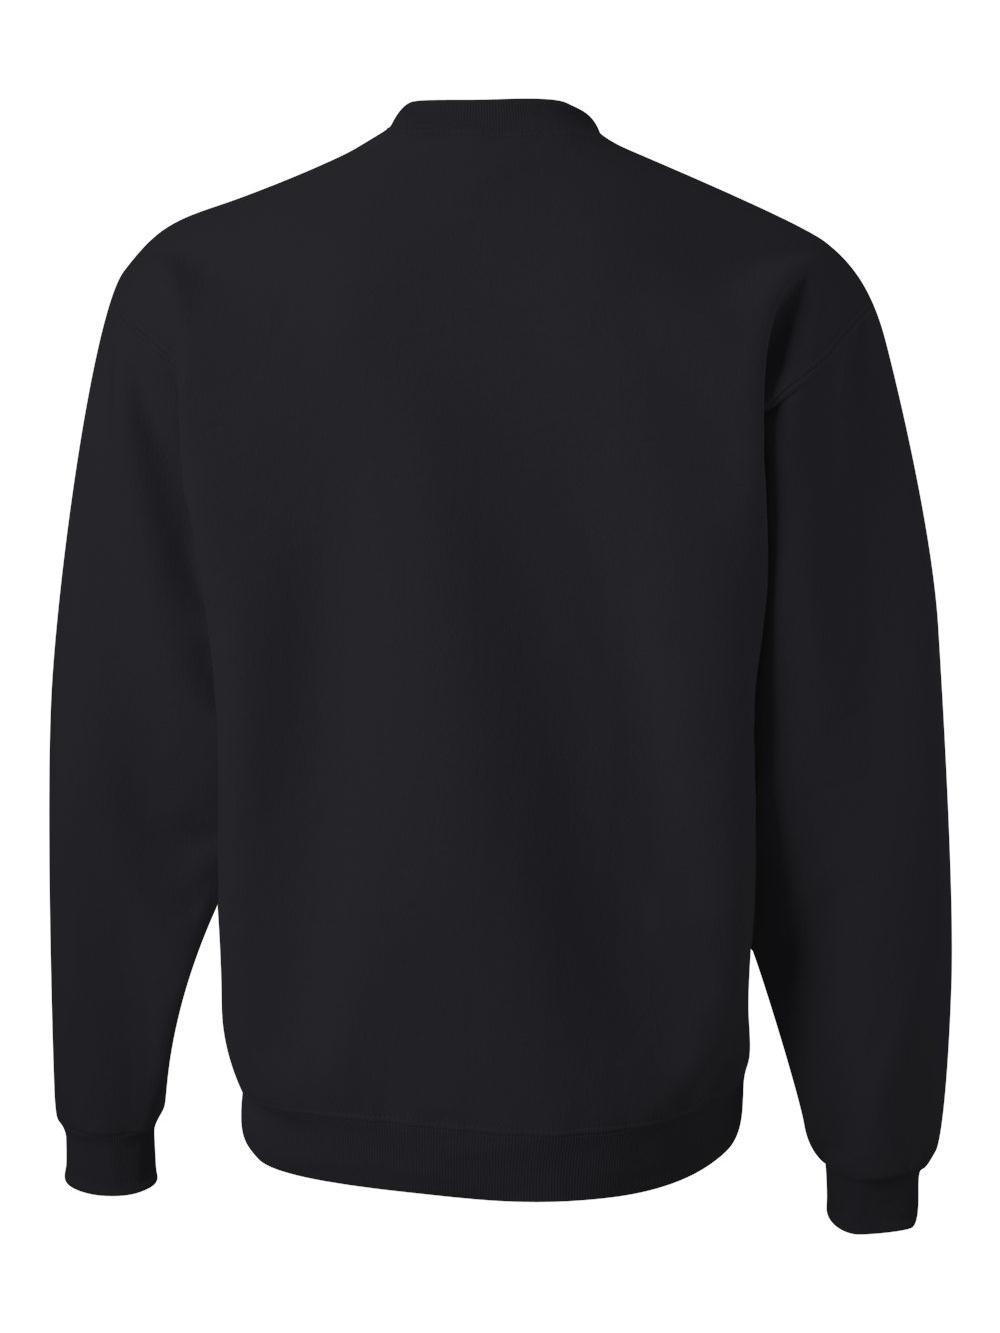 Jerzees-NuBlend-Crewneck-Sweatshirt-562MR thumbnail 10